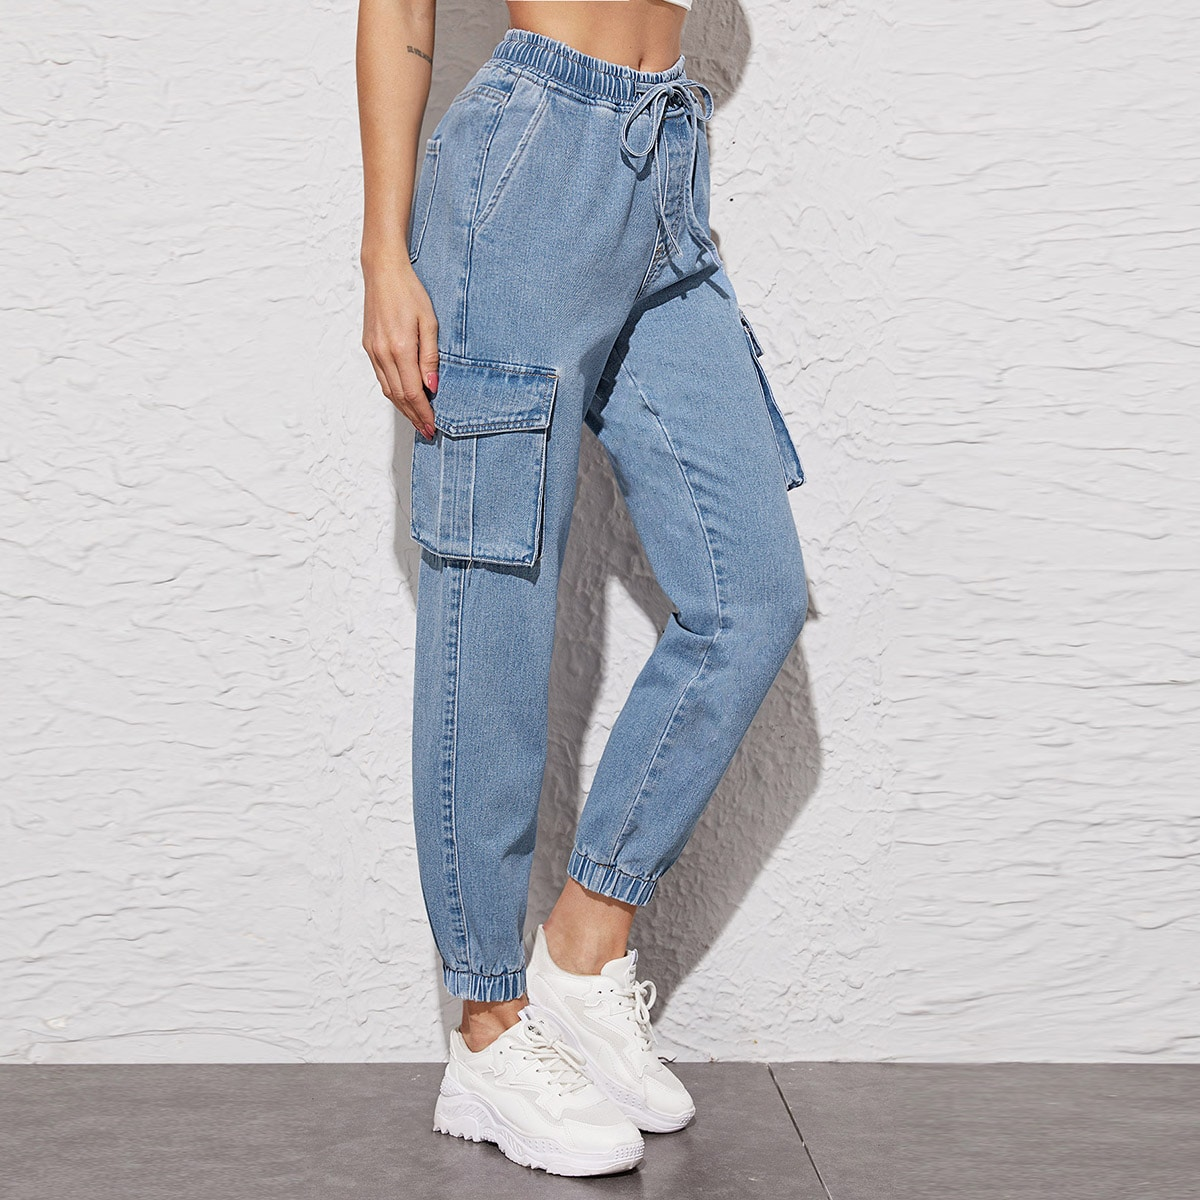 High Waisted Drawstring Waist Cargo Jeans